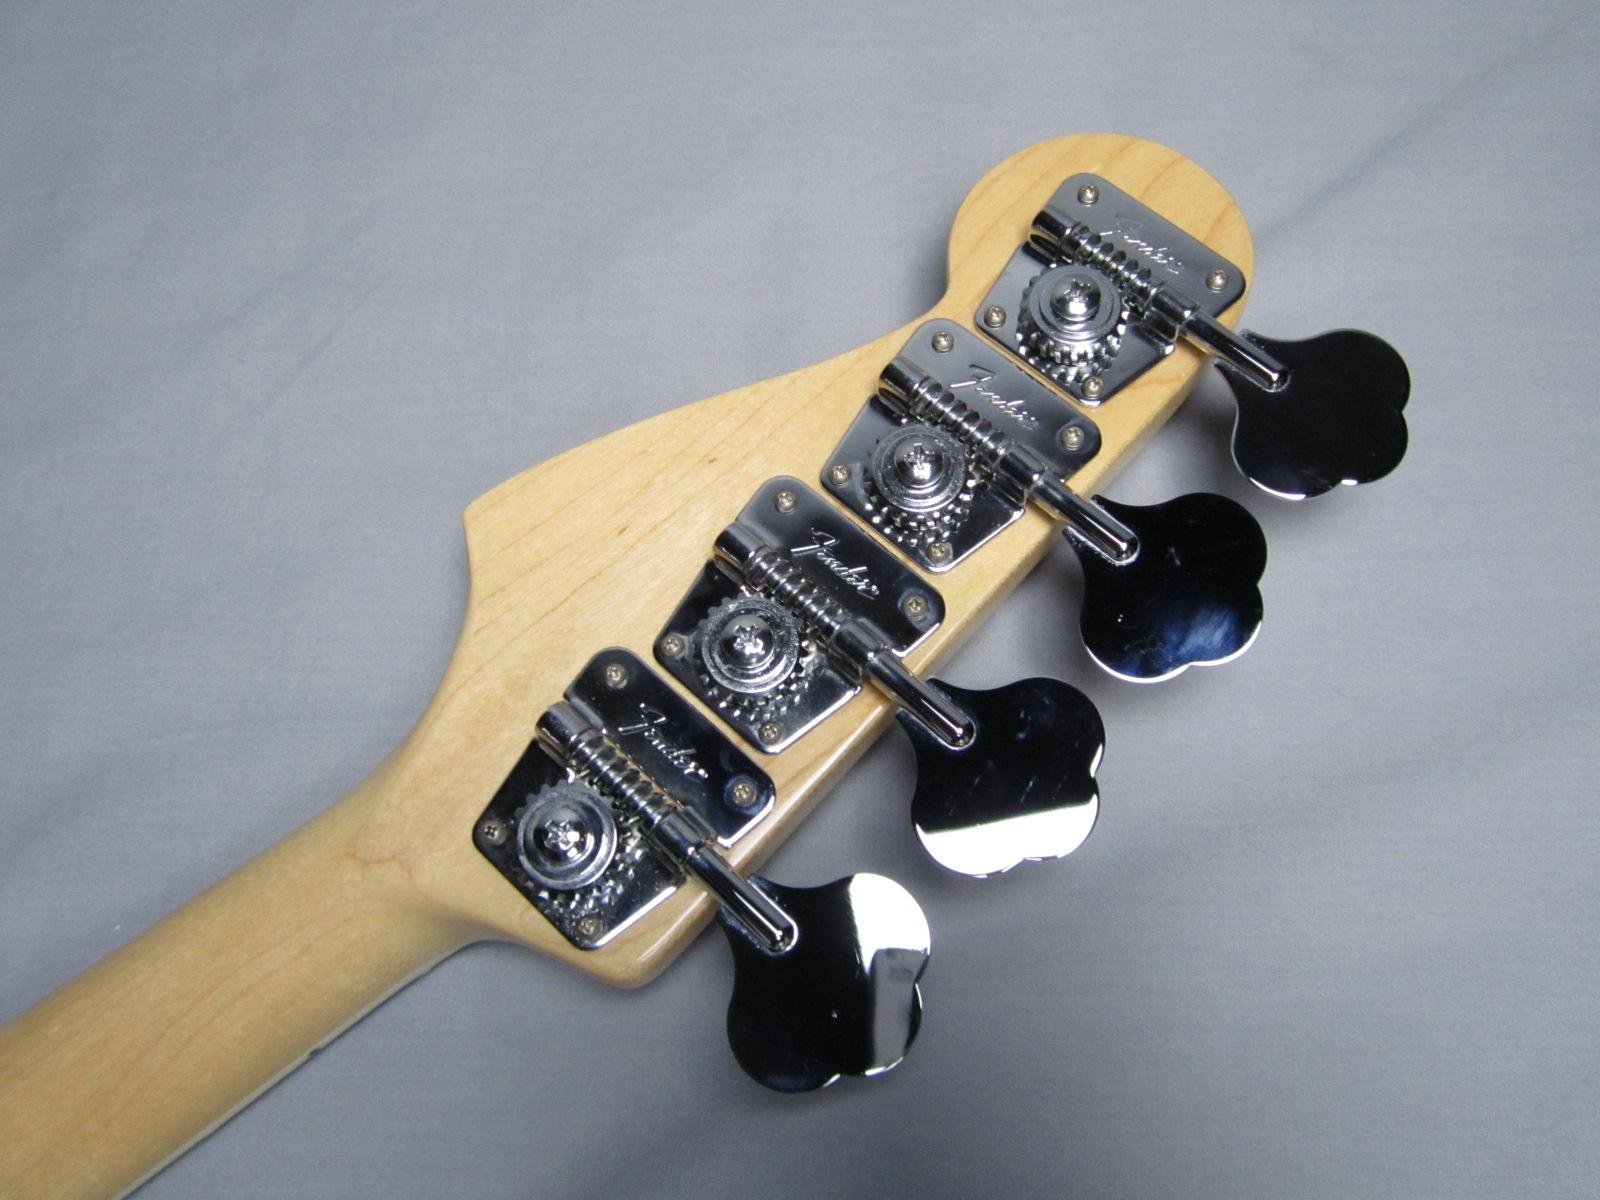 American Vintage '74 Jazz Bass / Rosewoodのヘッド裏-アップ画像